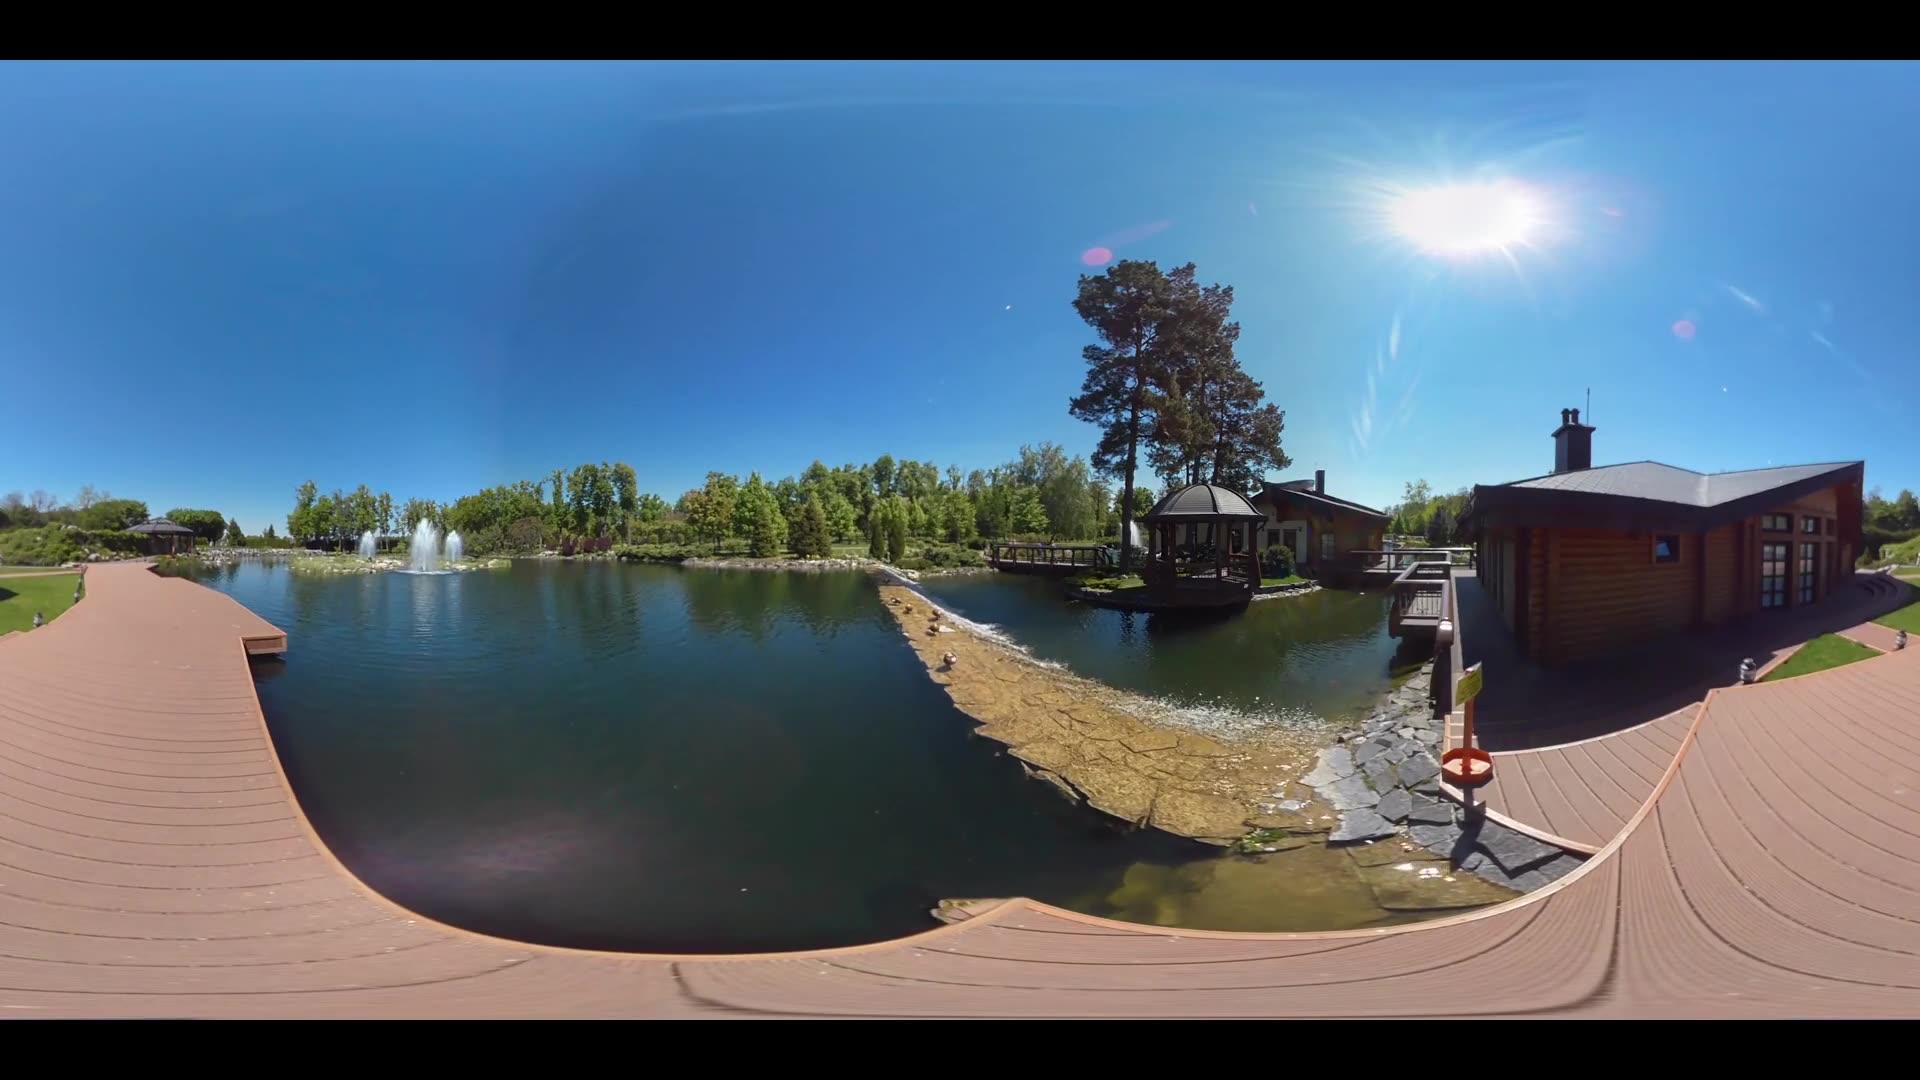 Luxury garden lake landscape. 360 degrees panorama of garden gazebo with park lake. 360 degree view of park lake landscape. Summer garden pond landscape